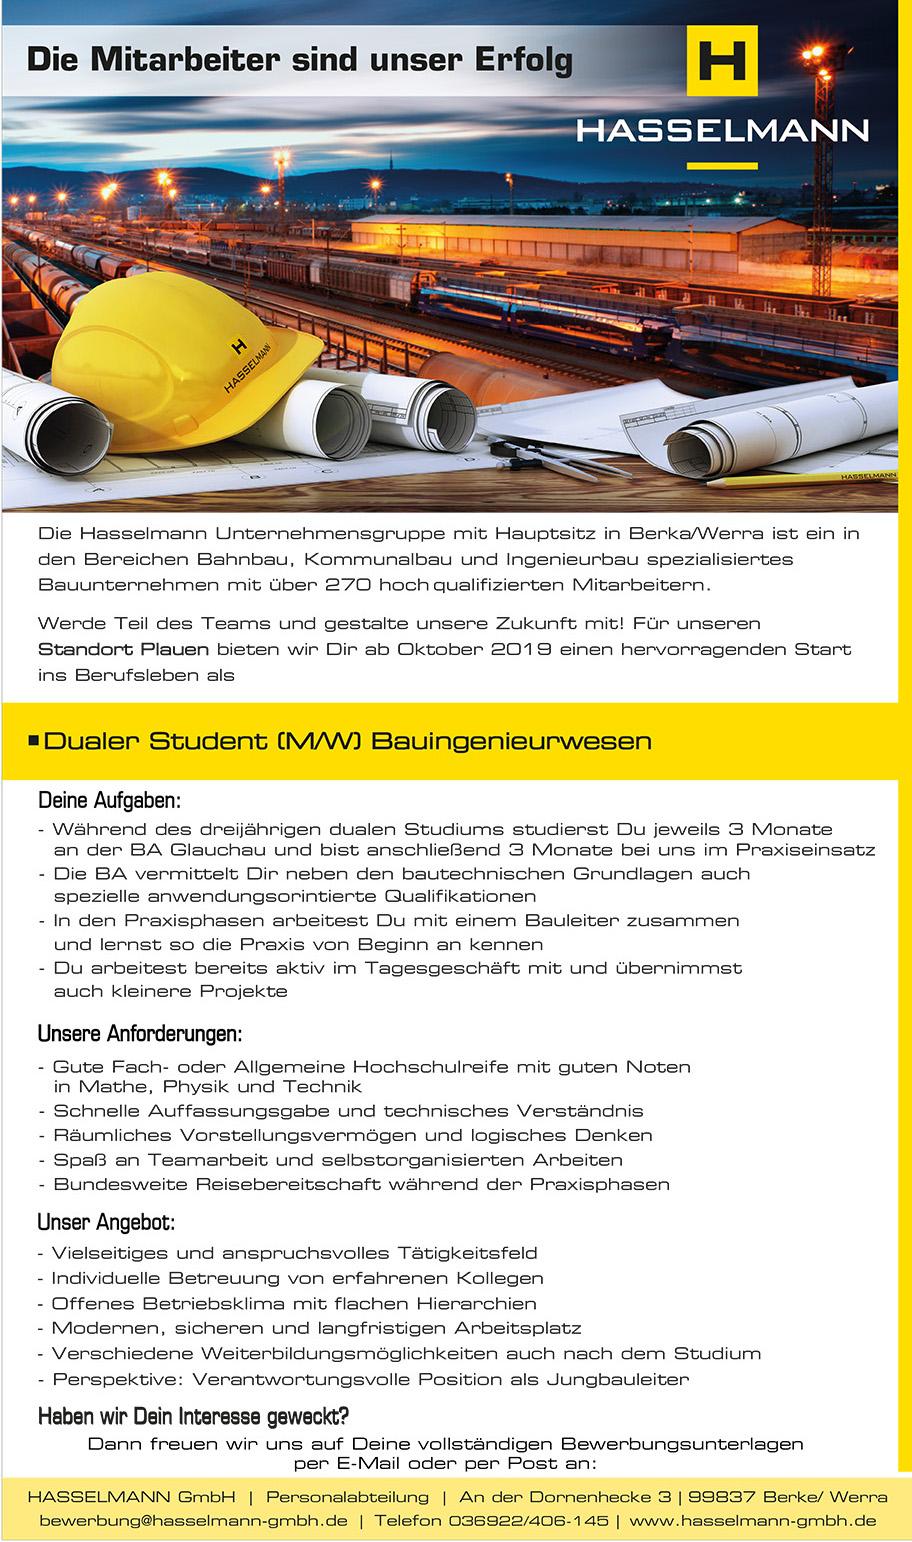 Hasselmann_dualer Student_Plauen